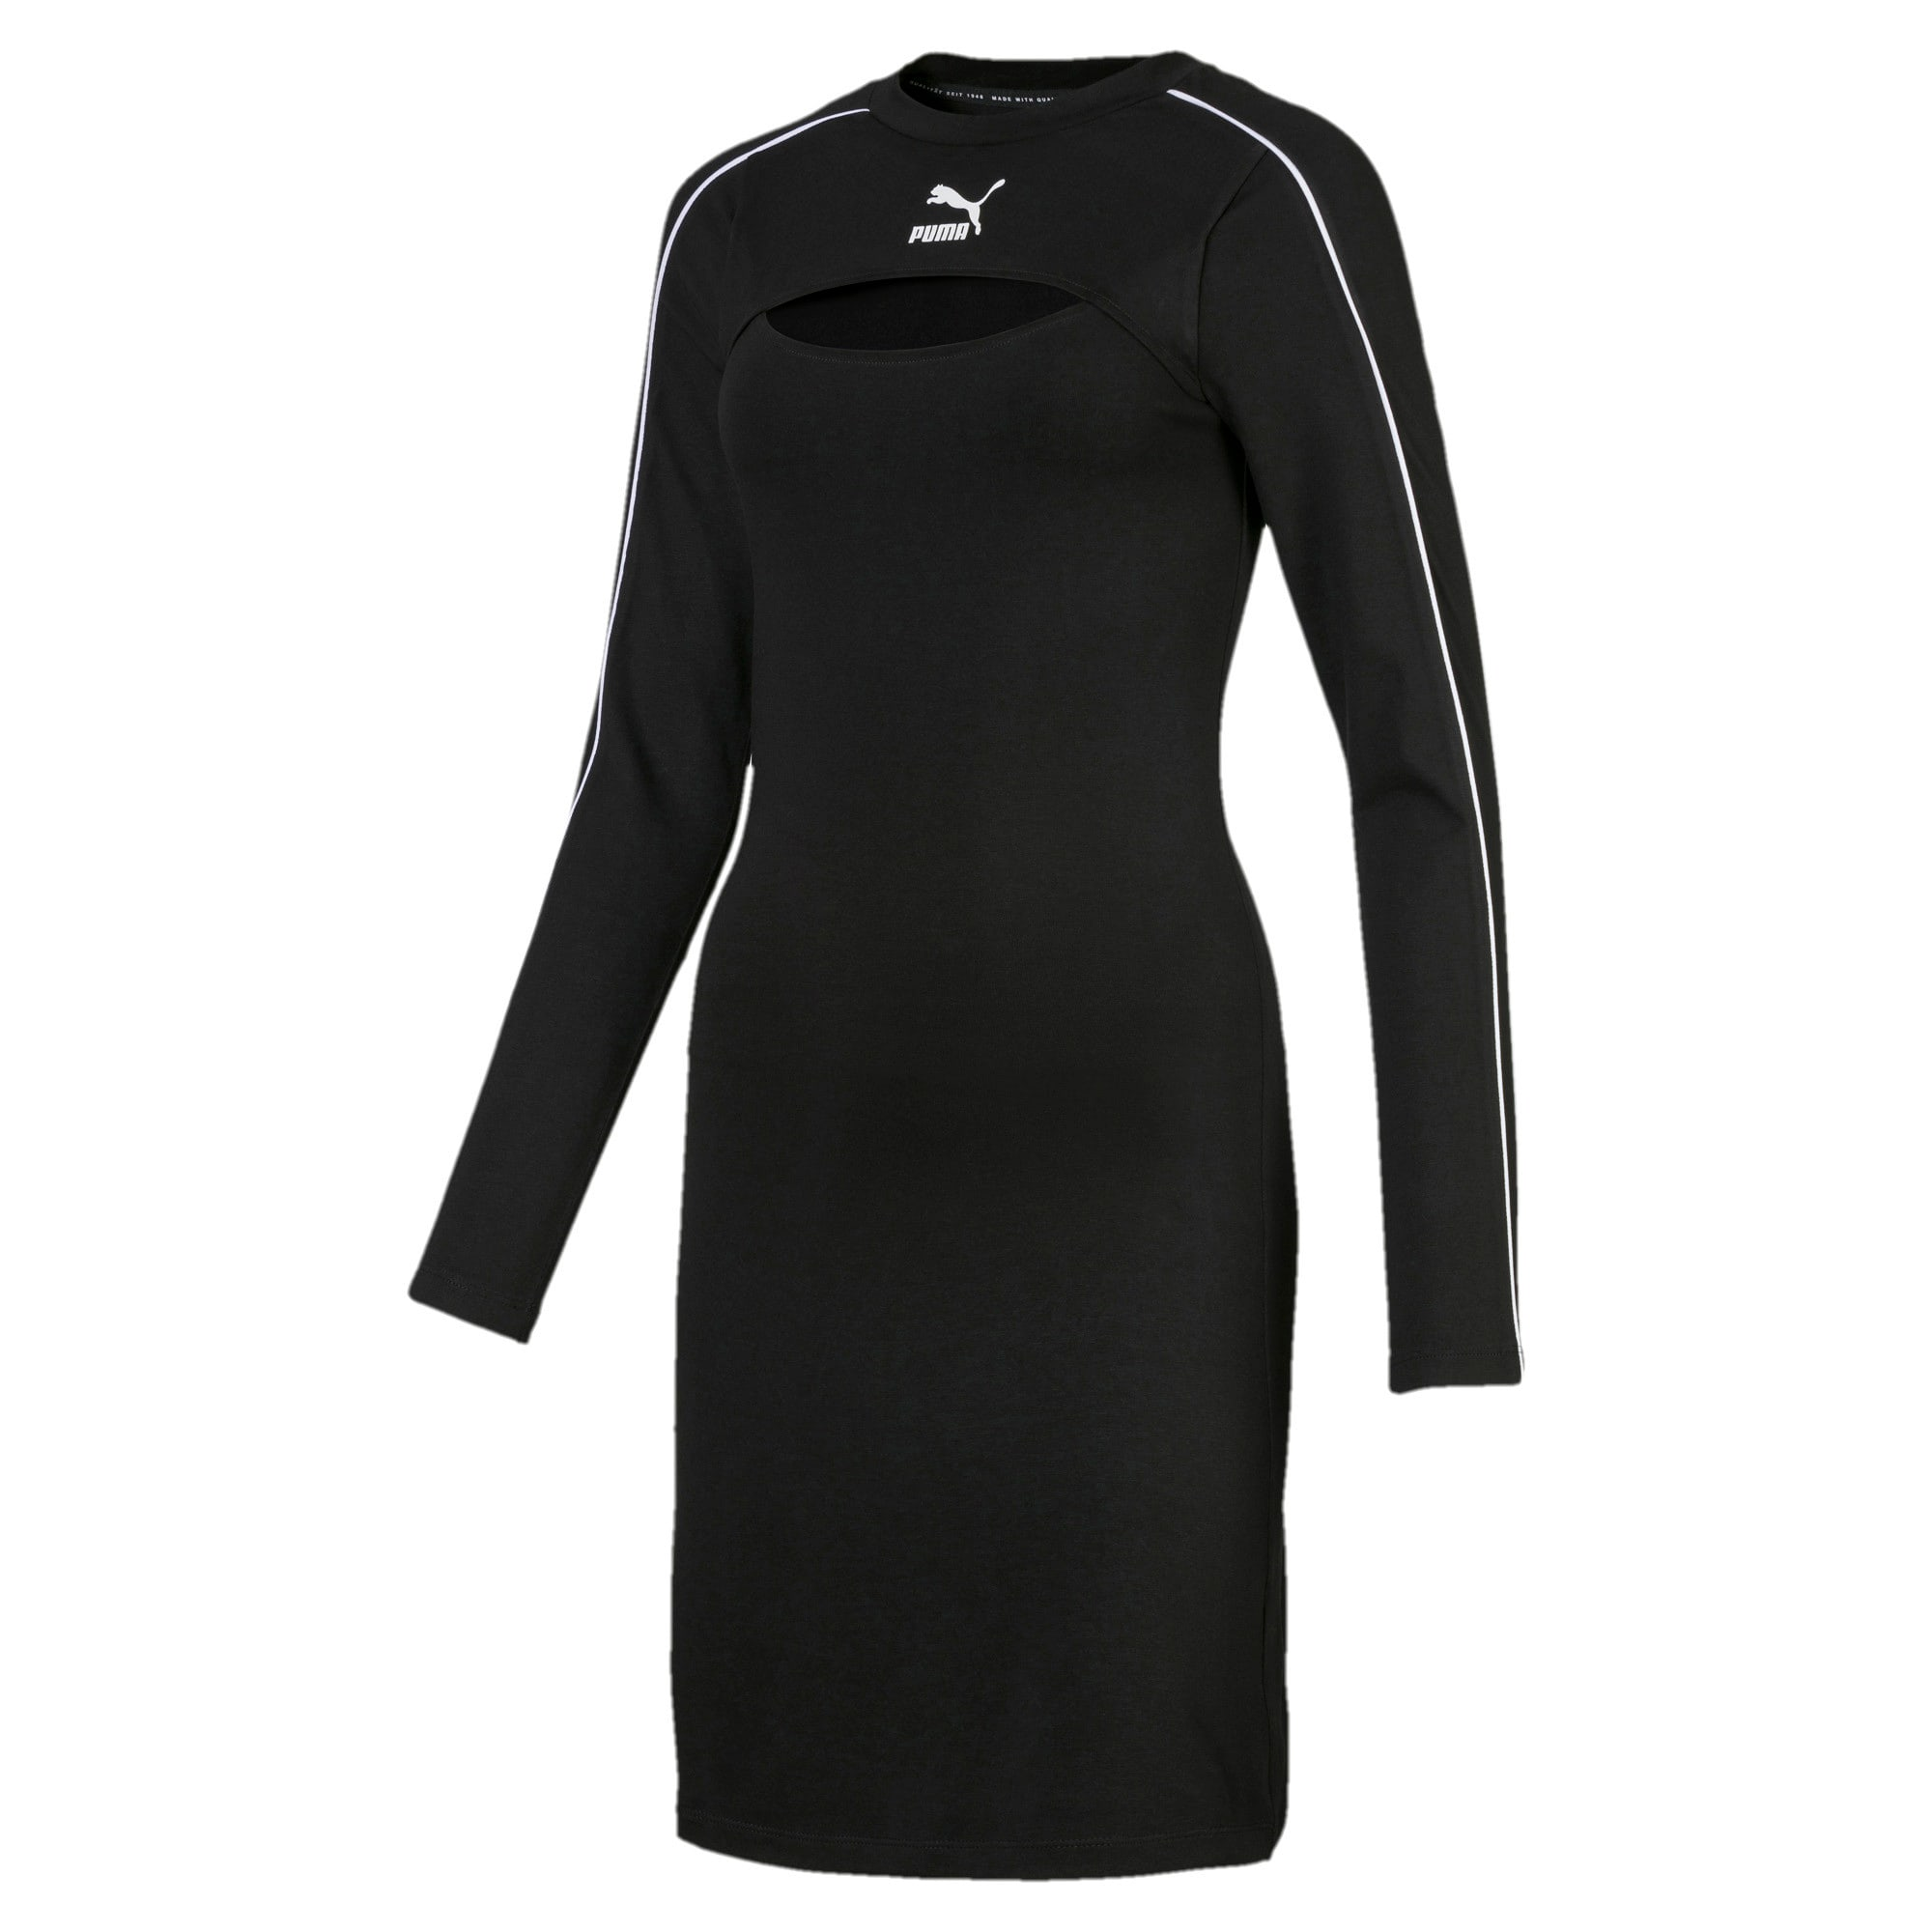 Thumbnail 4 van Classics jurk voor vrouwen, Puma Black, medium